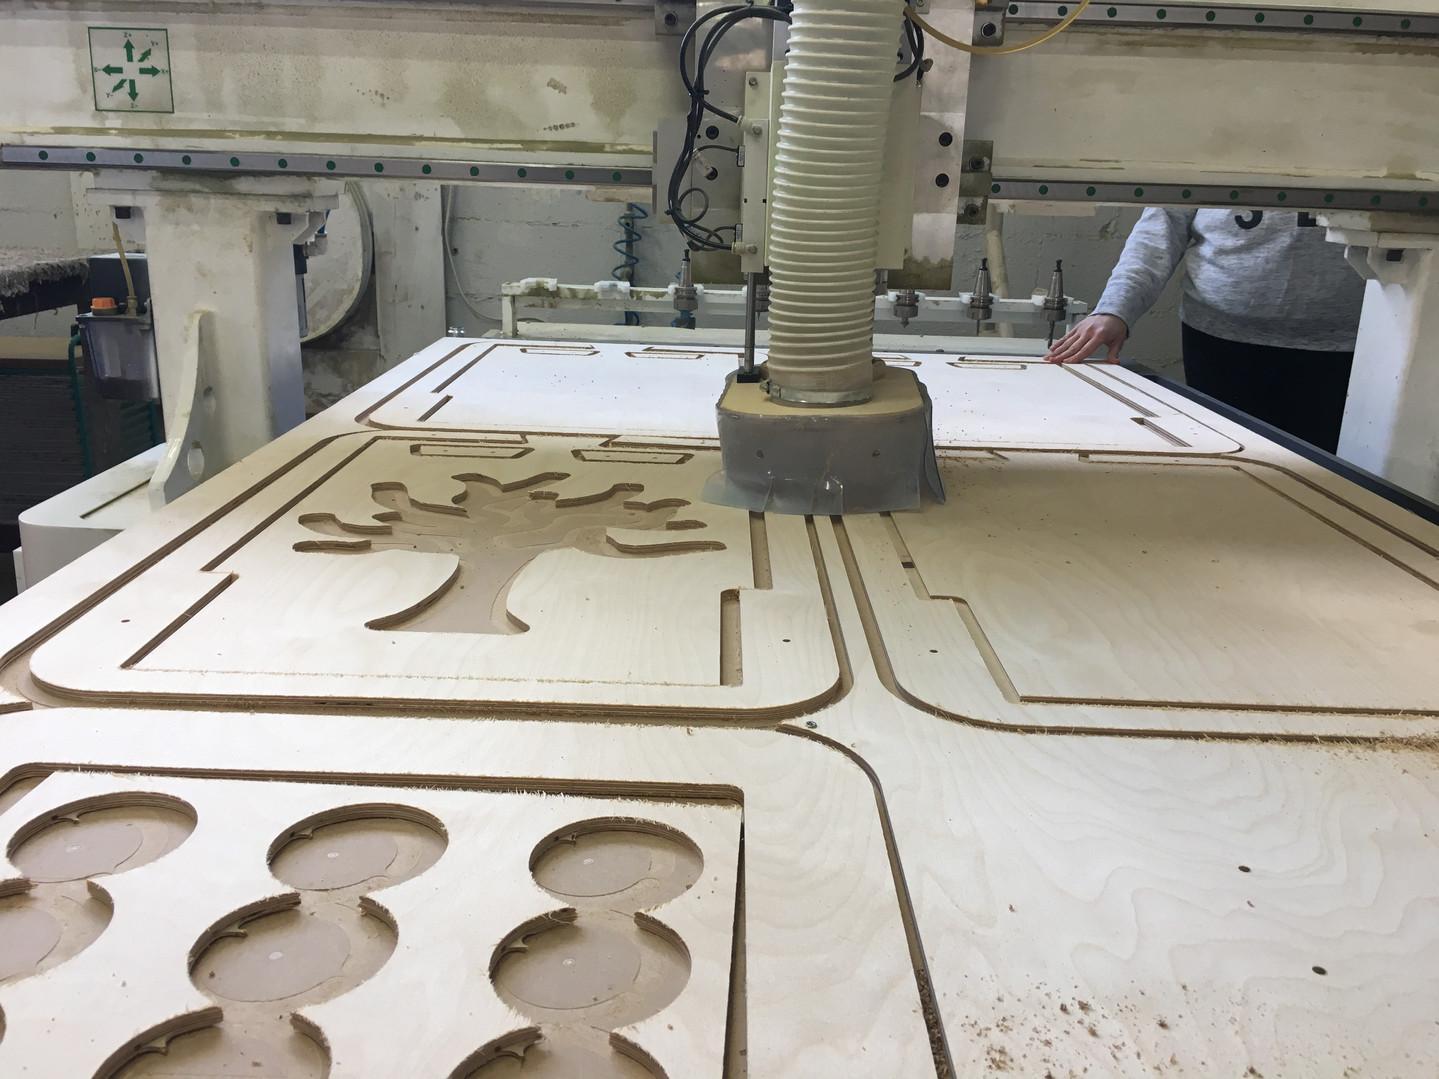 CNCing